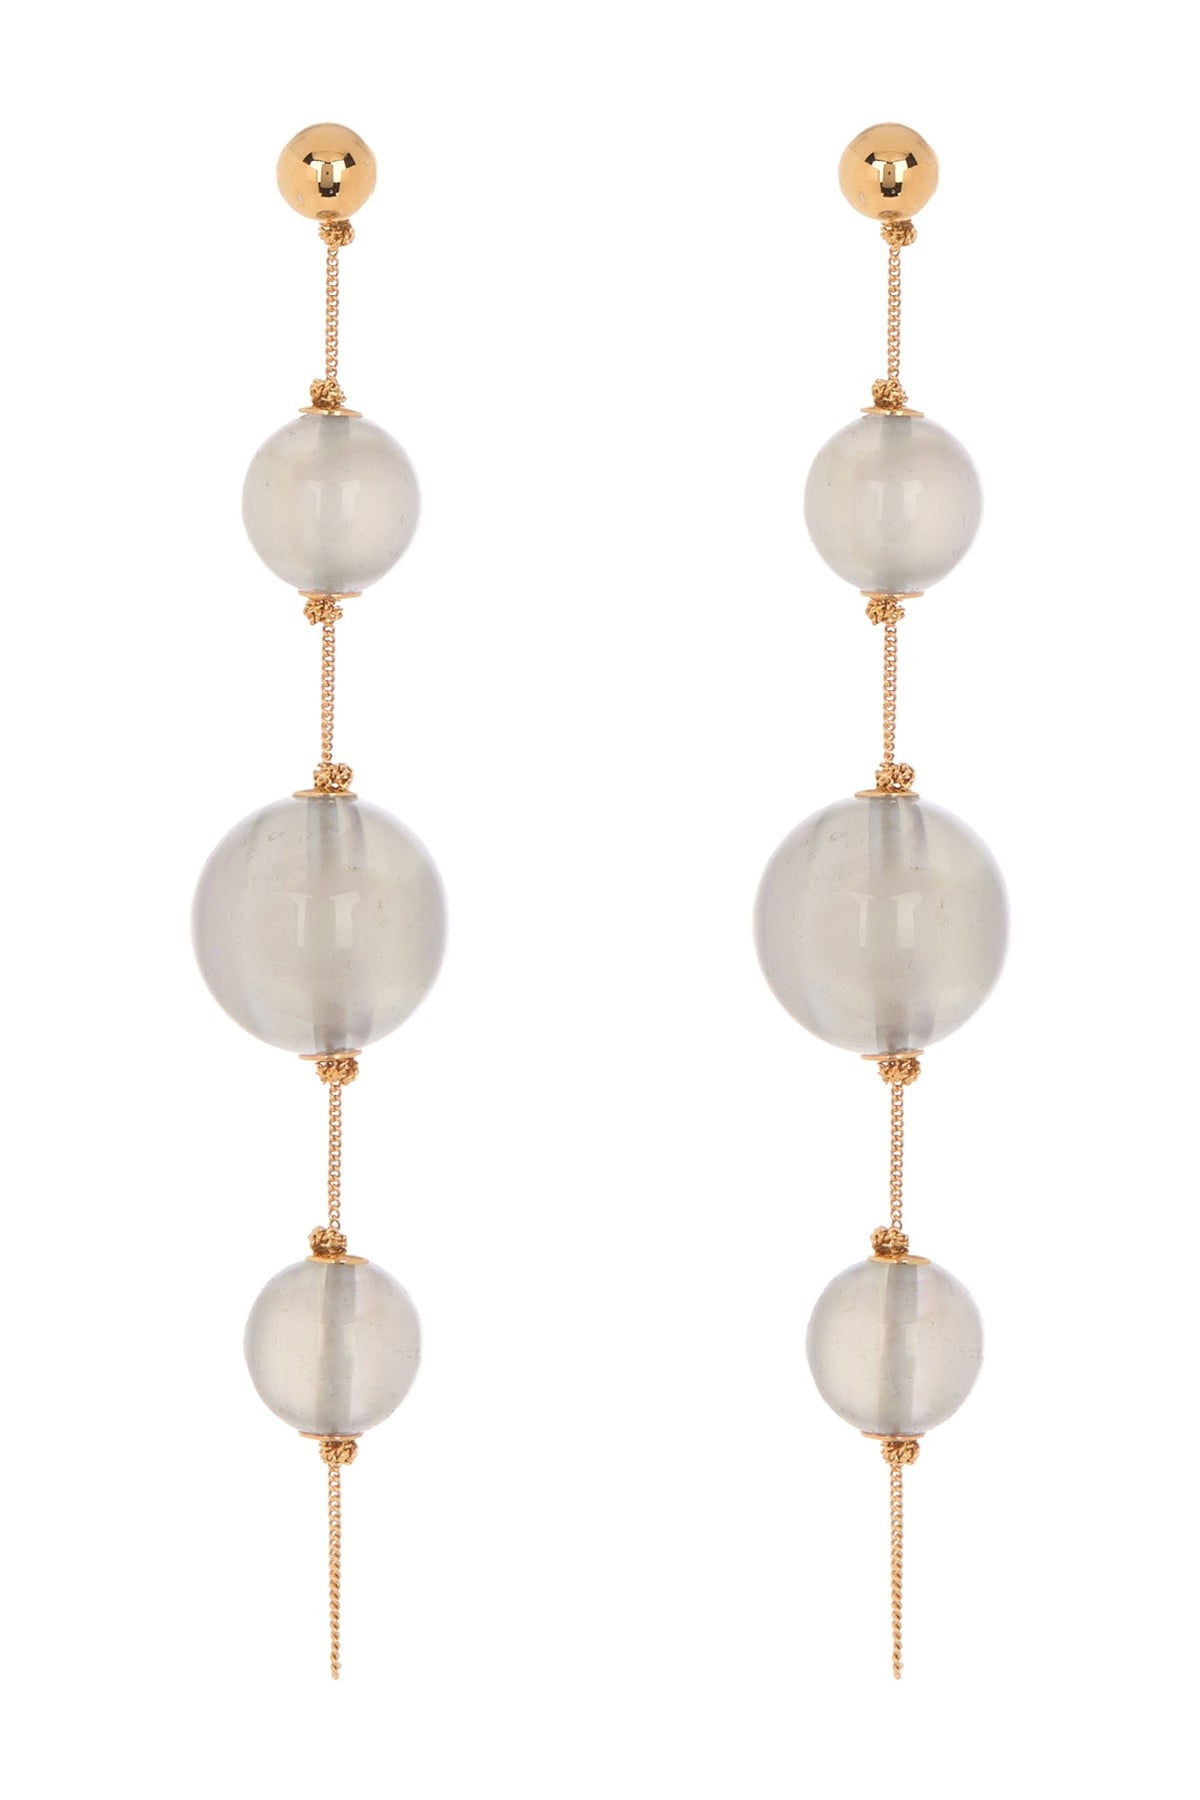 Burberry Triple Orb Chain Drop Earrings In Brown